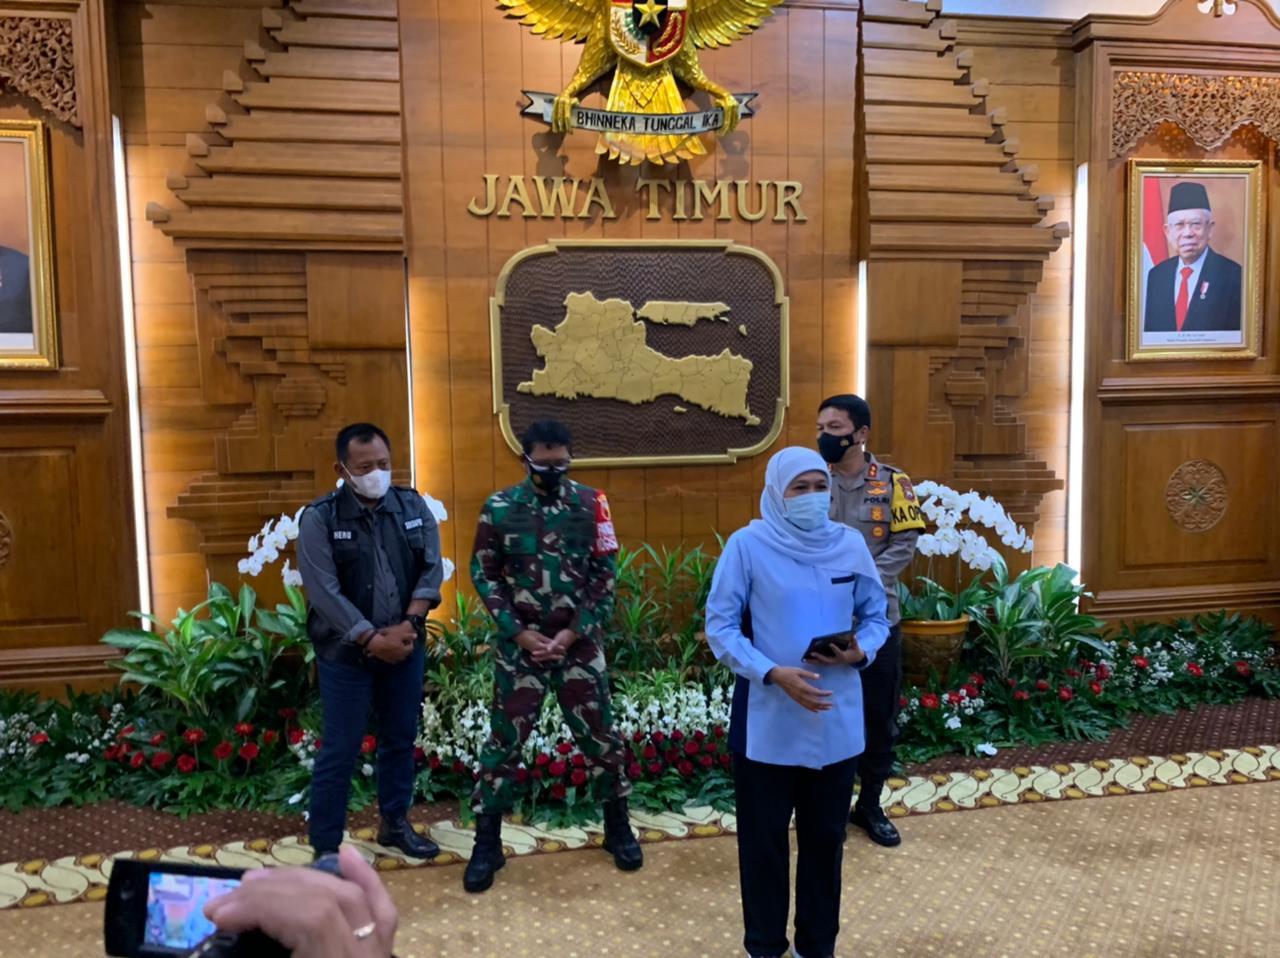 Gubernur Jawa Timur, Khofifah Indar Parawansa diwawancara oleh wartawan di Gedung Negara Grahadi Surabaya, Senin (08/02/2021) malam. (Sumber Foto: Rangga Aji/Tugu Jatim) ppkm mikro jatim